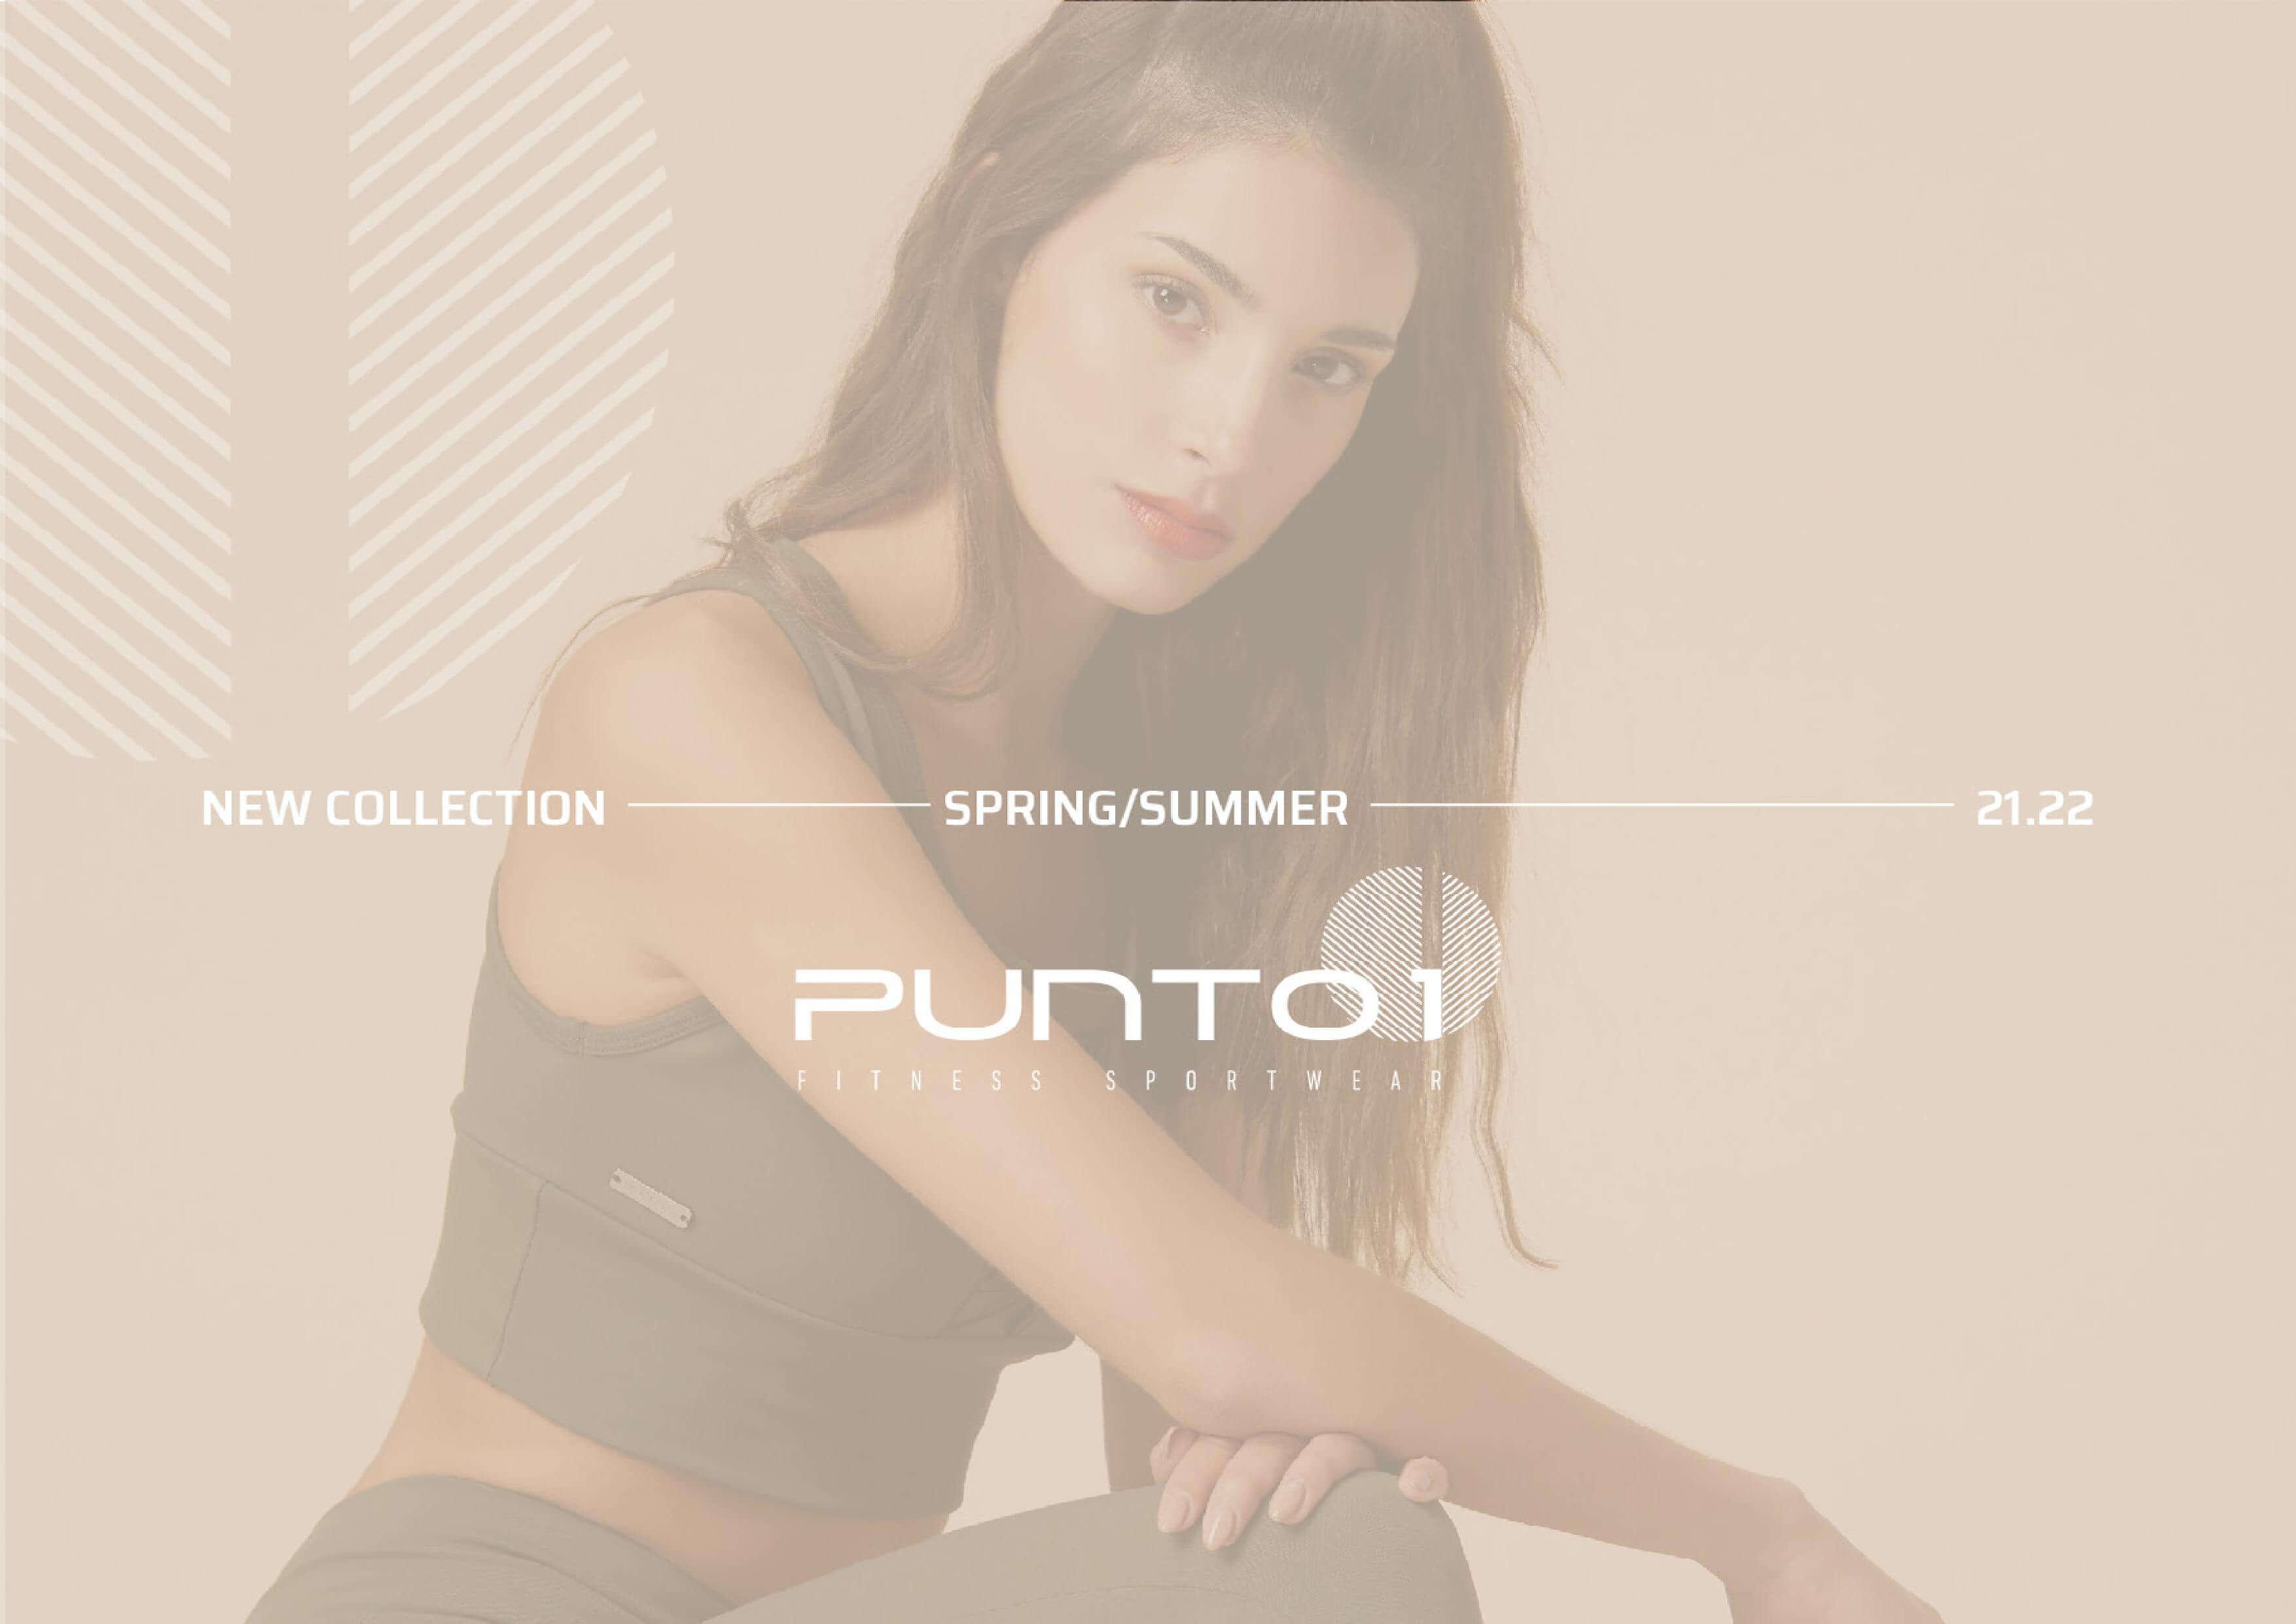 Punto1-CatalogoOI2020-01_1.jpg